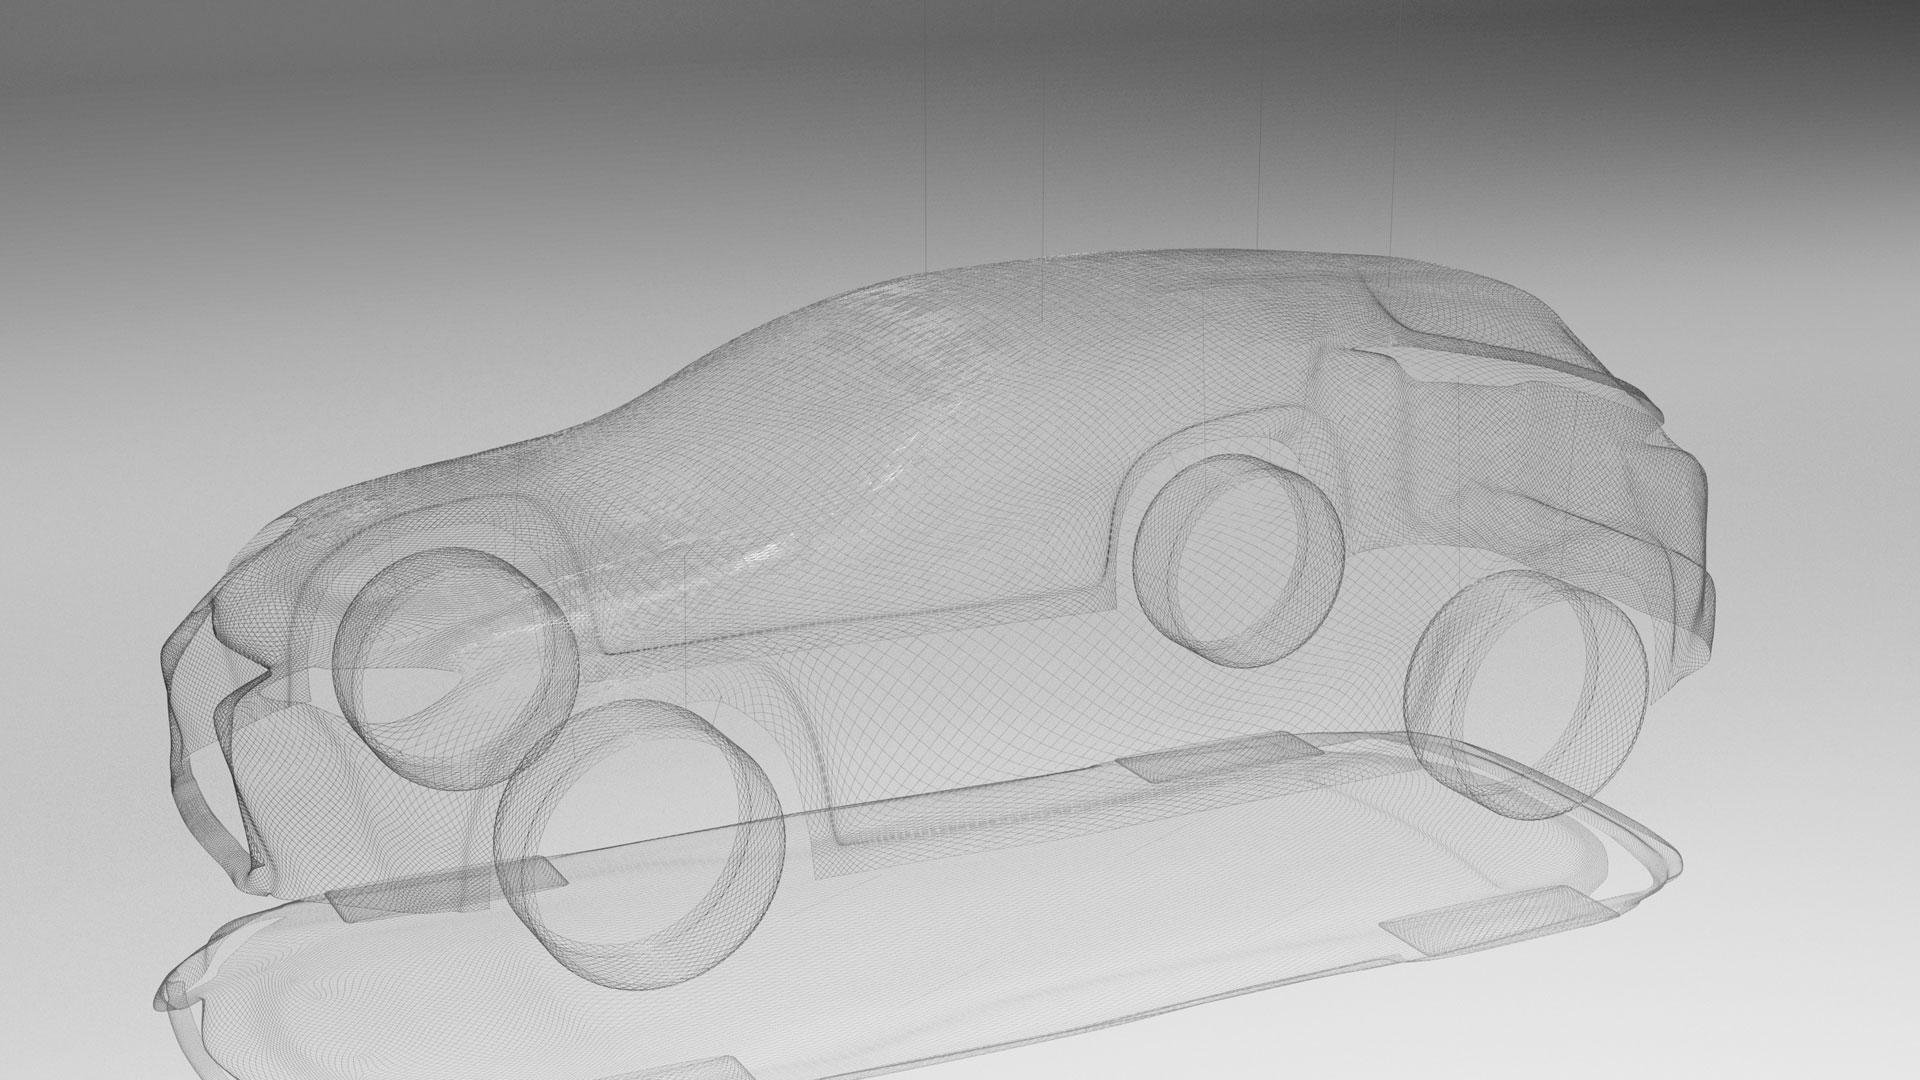 Lexus UX Art Car by Mayice Studio hero asset